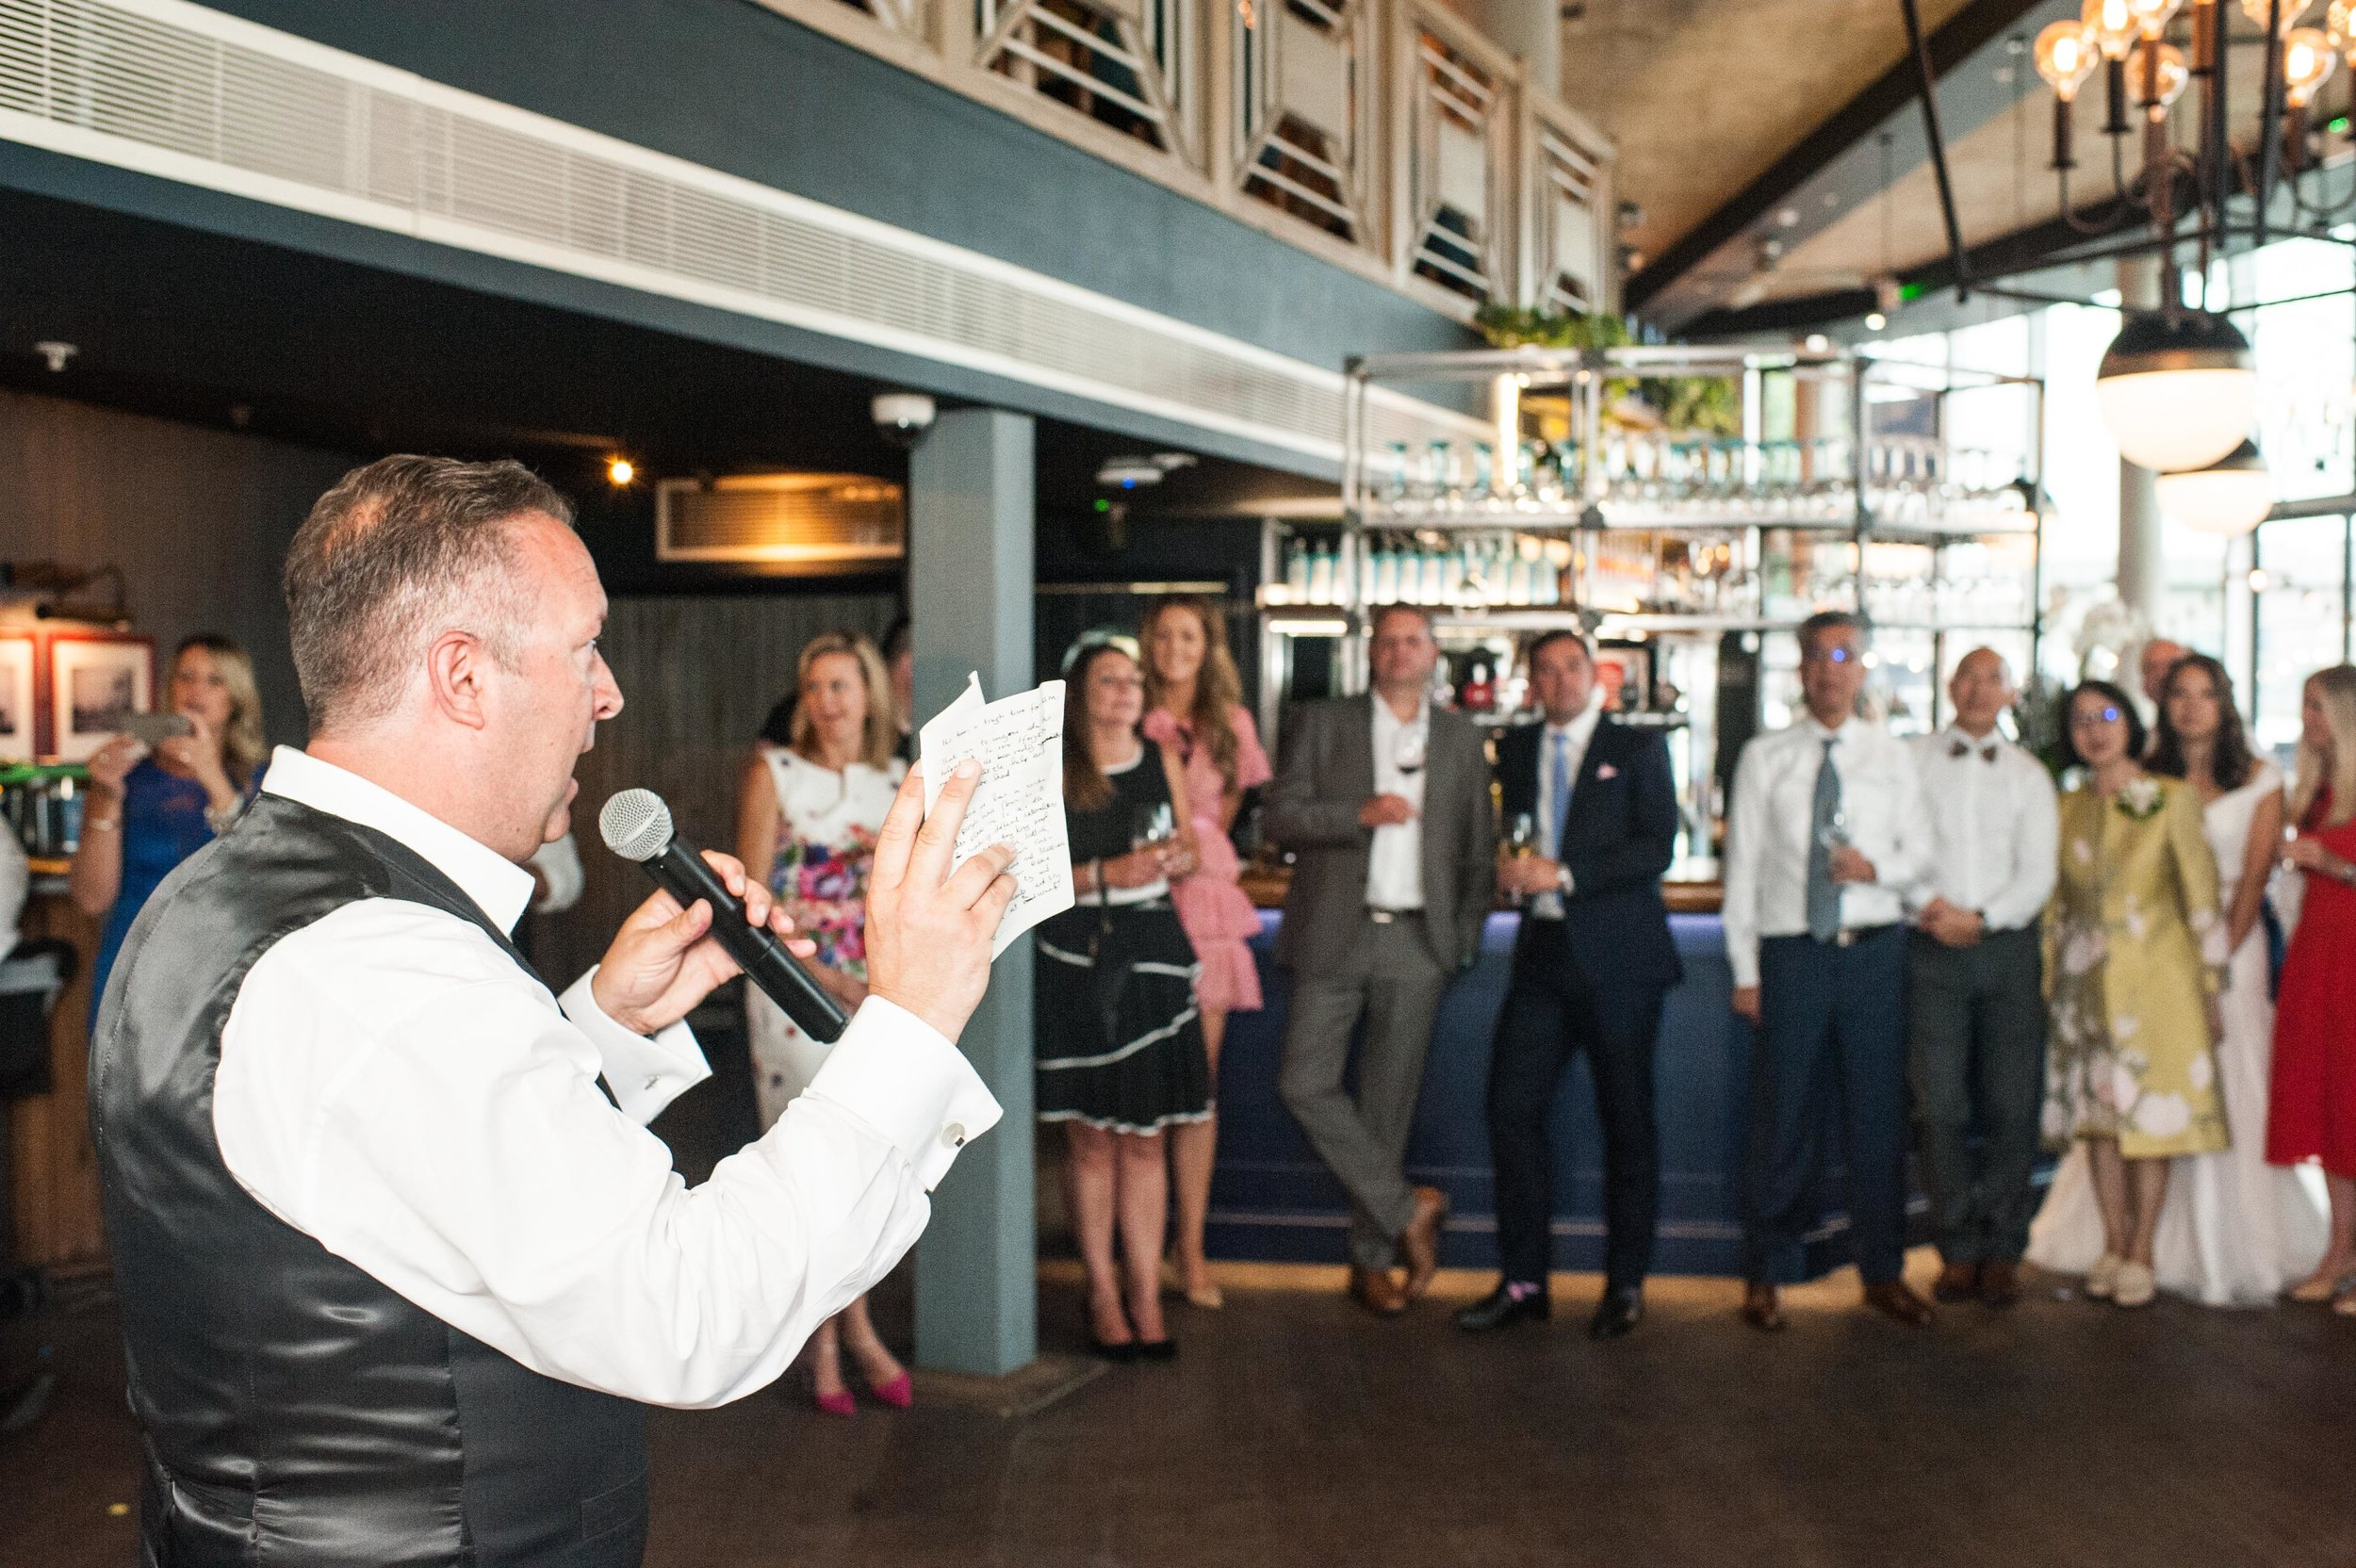 D&M_Marylebone Town Hall Wedding (224 of 239).jpg